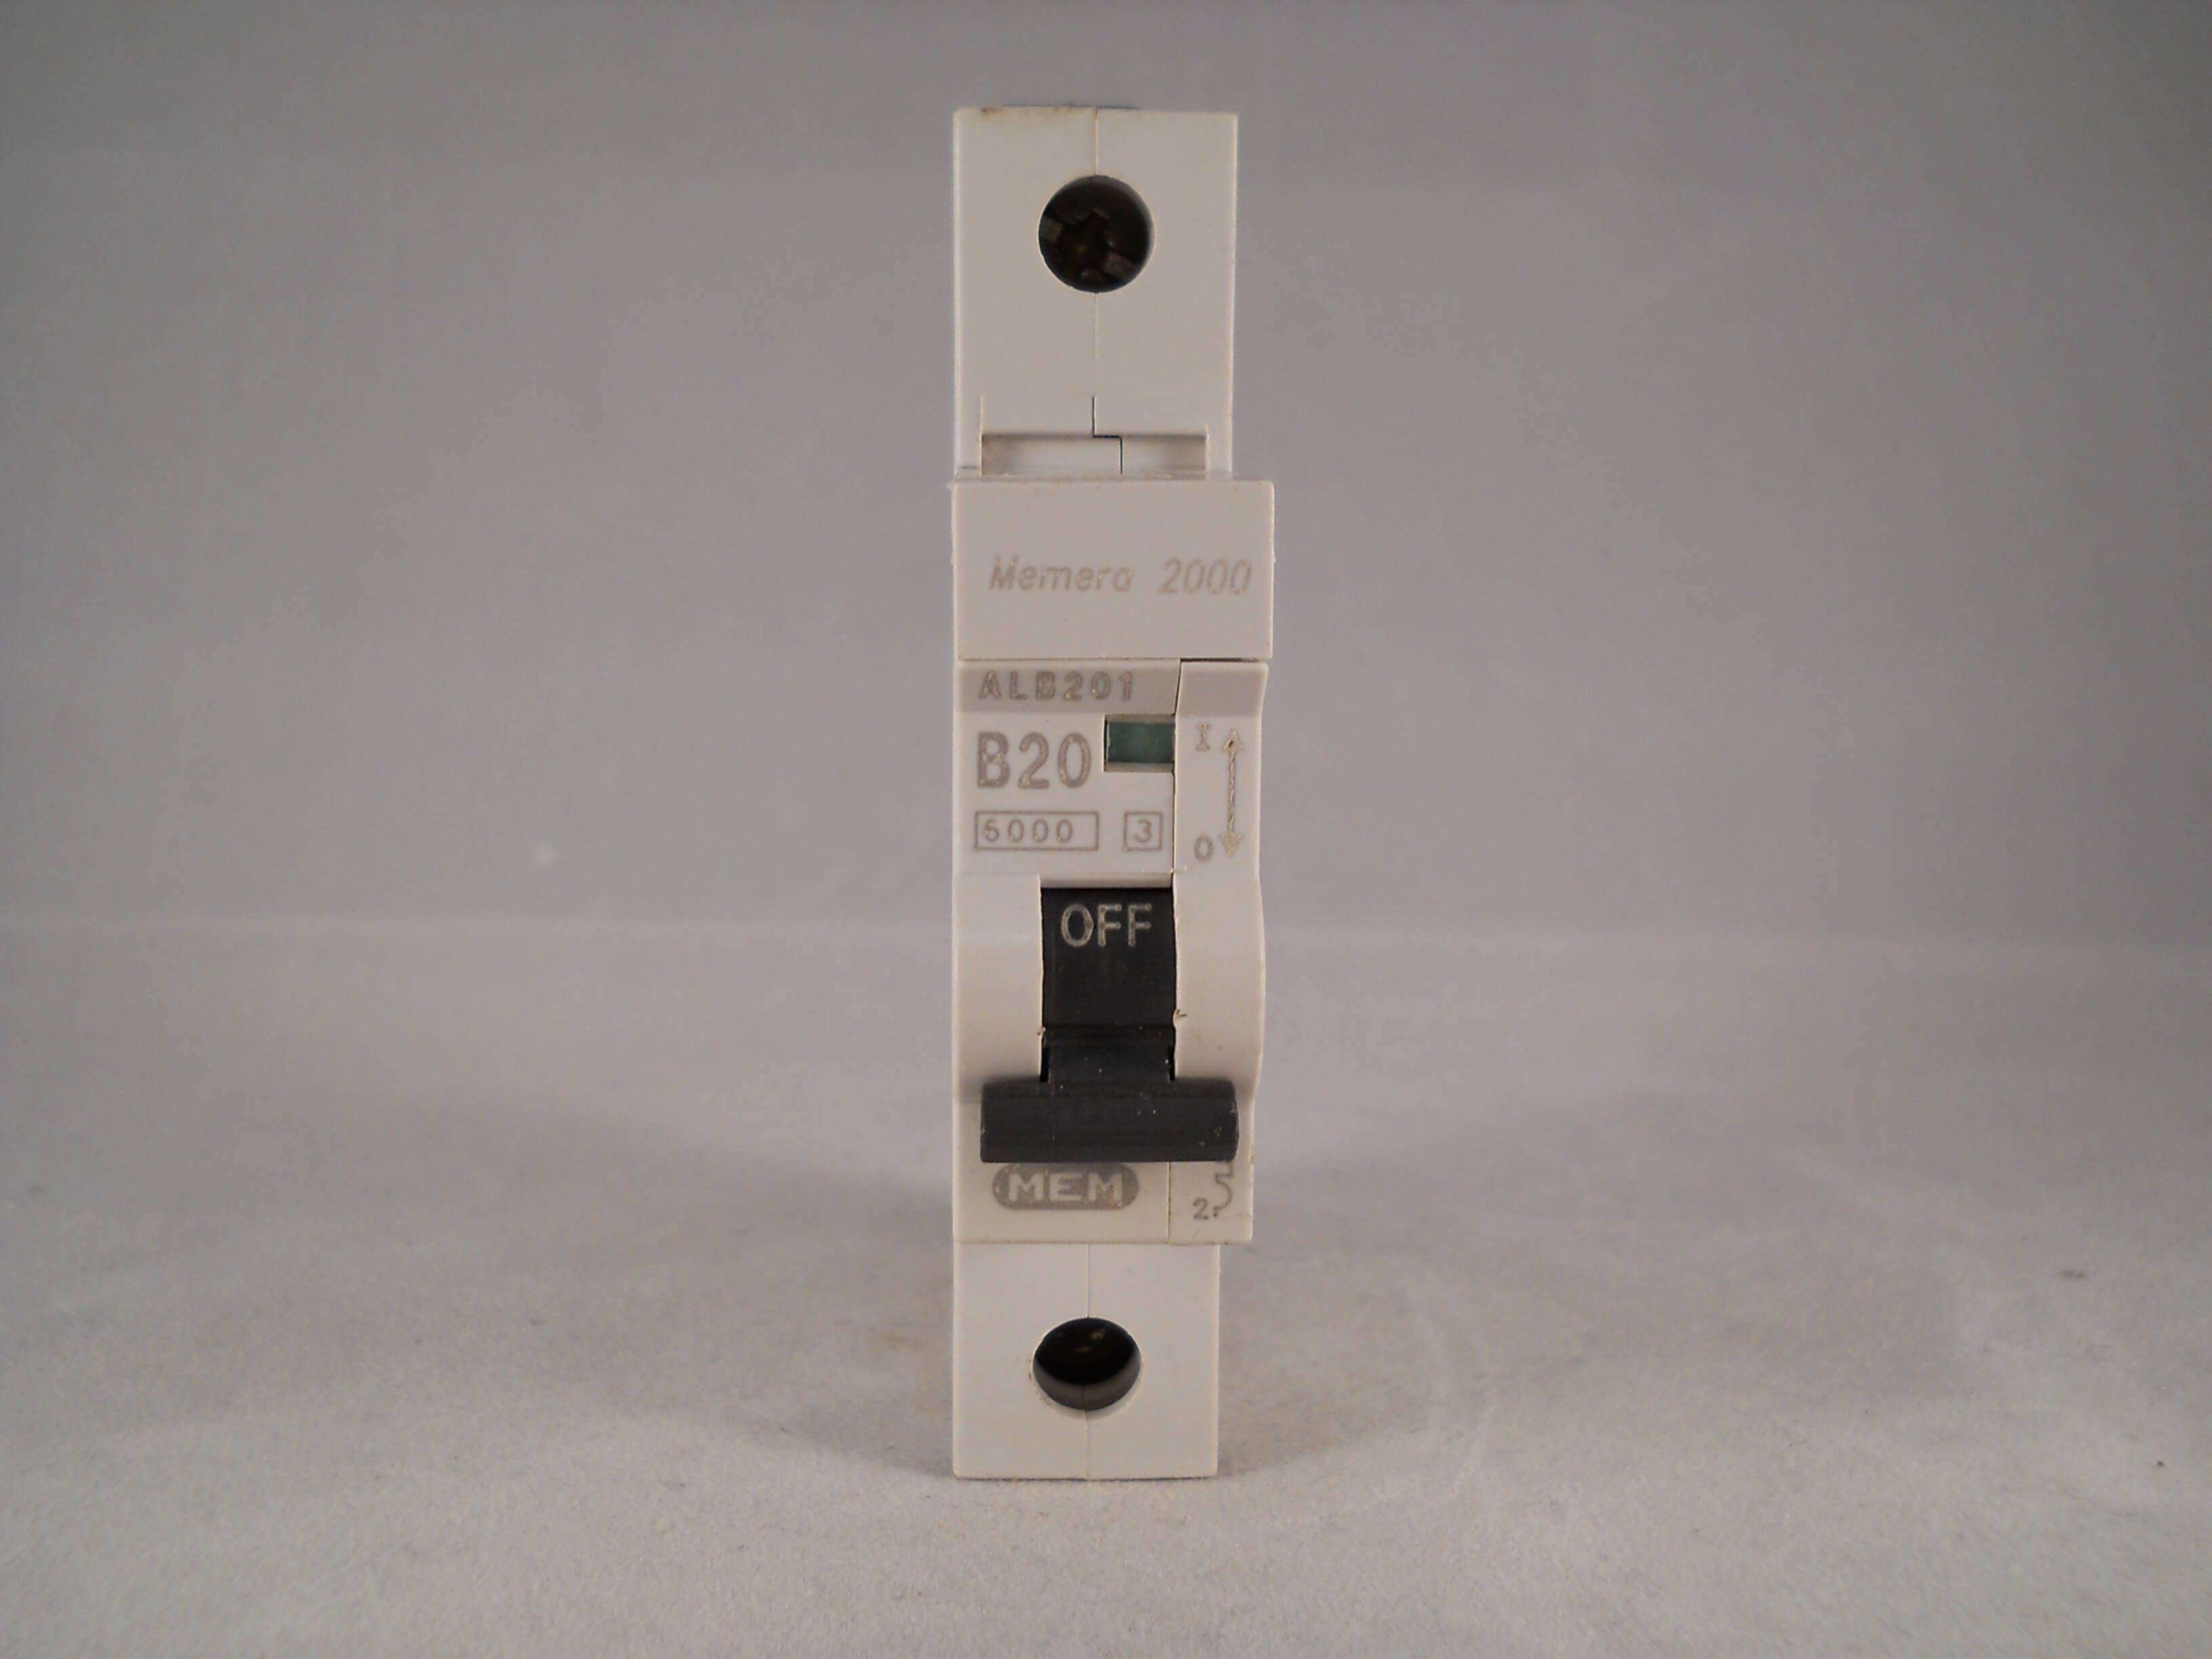 ALB201 2 1 memera 2000 fuse box memera 2000 fuse box \u2022 indy500 co memera 2000 fuse box at gsmx.co